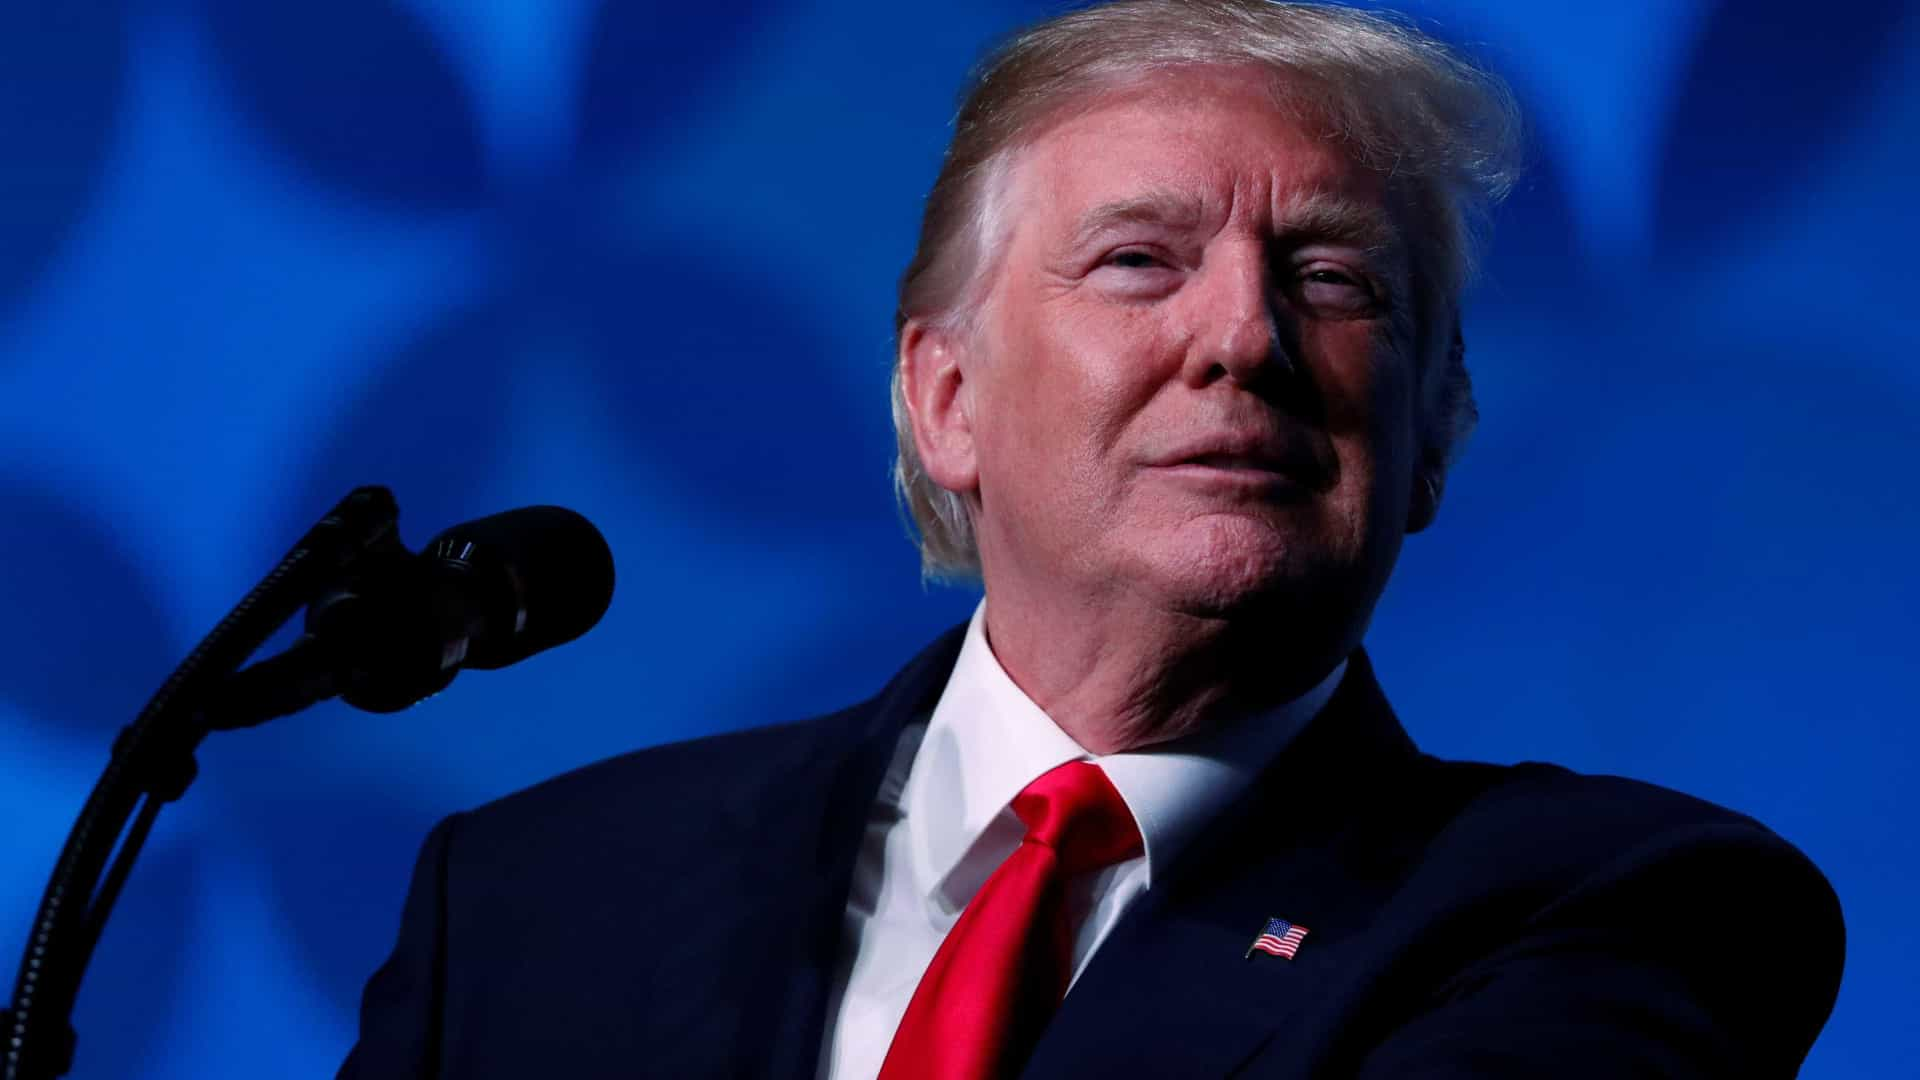 Trump vai discursar no encerramento do Fórum Económico de Davos